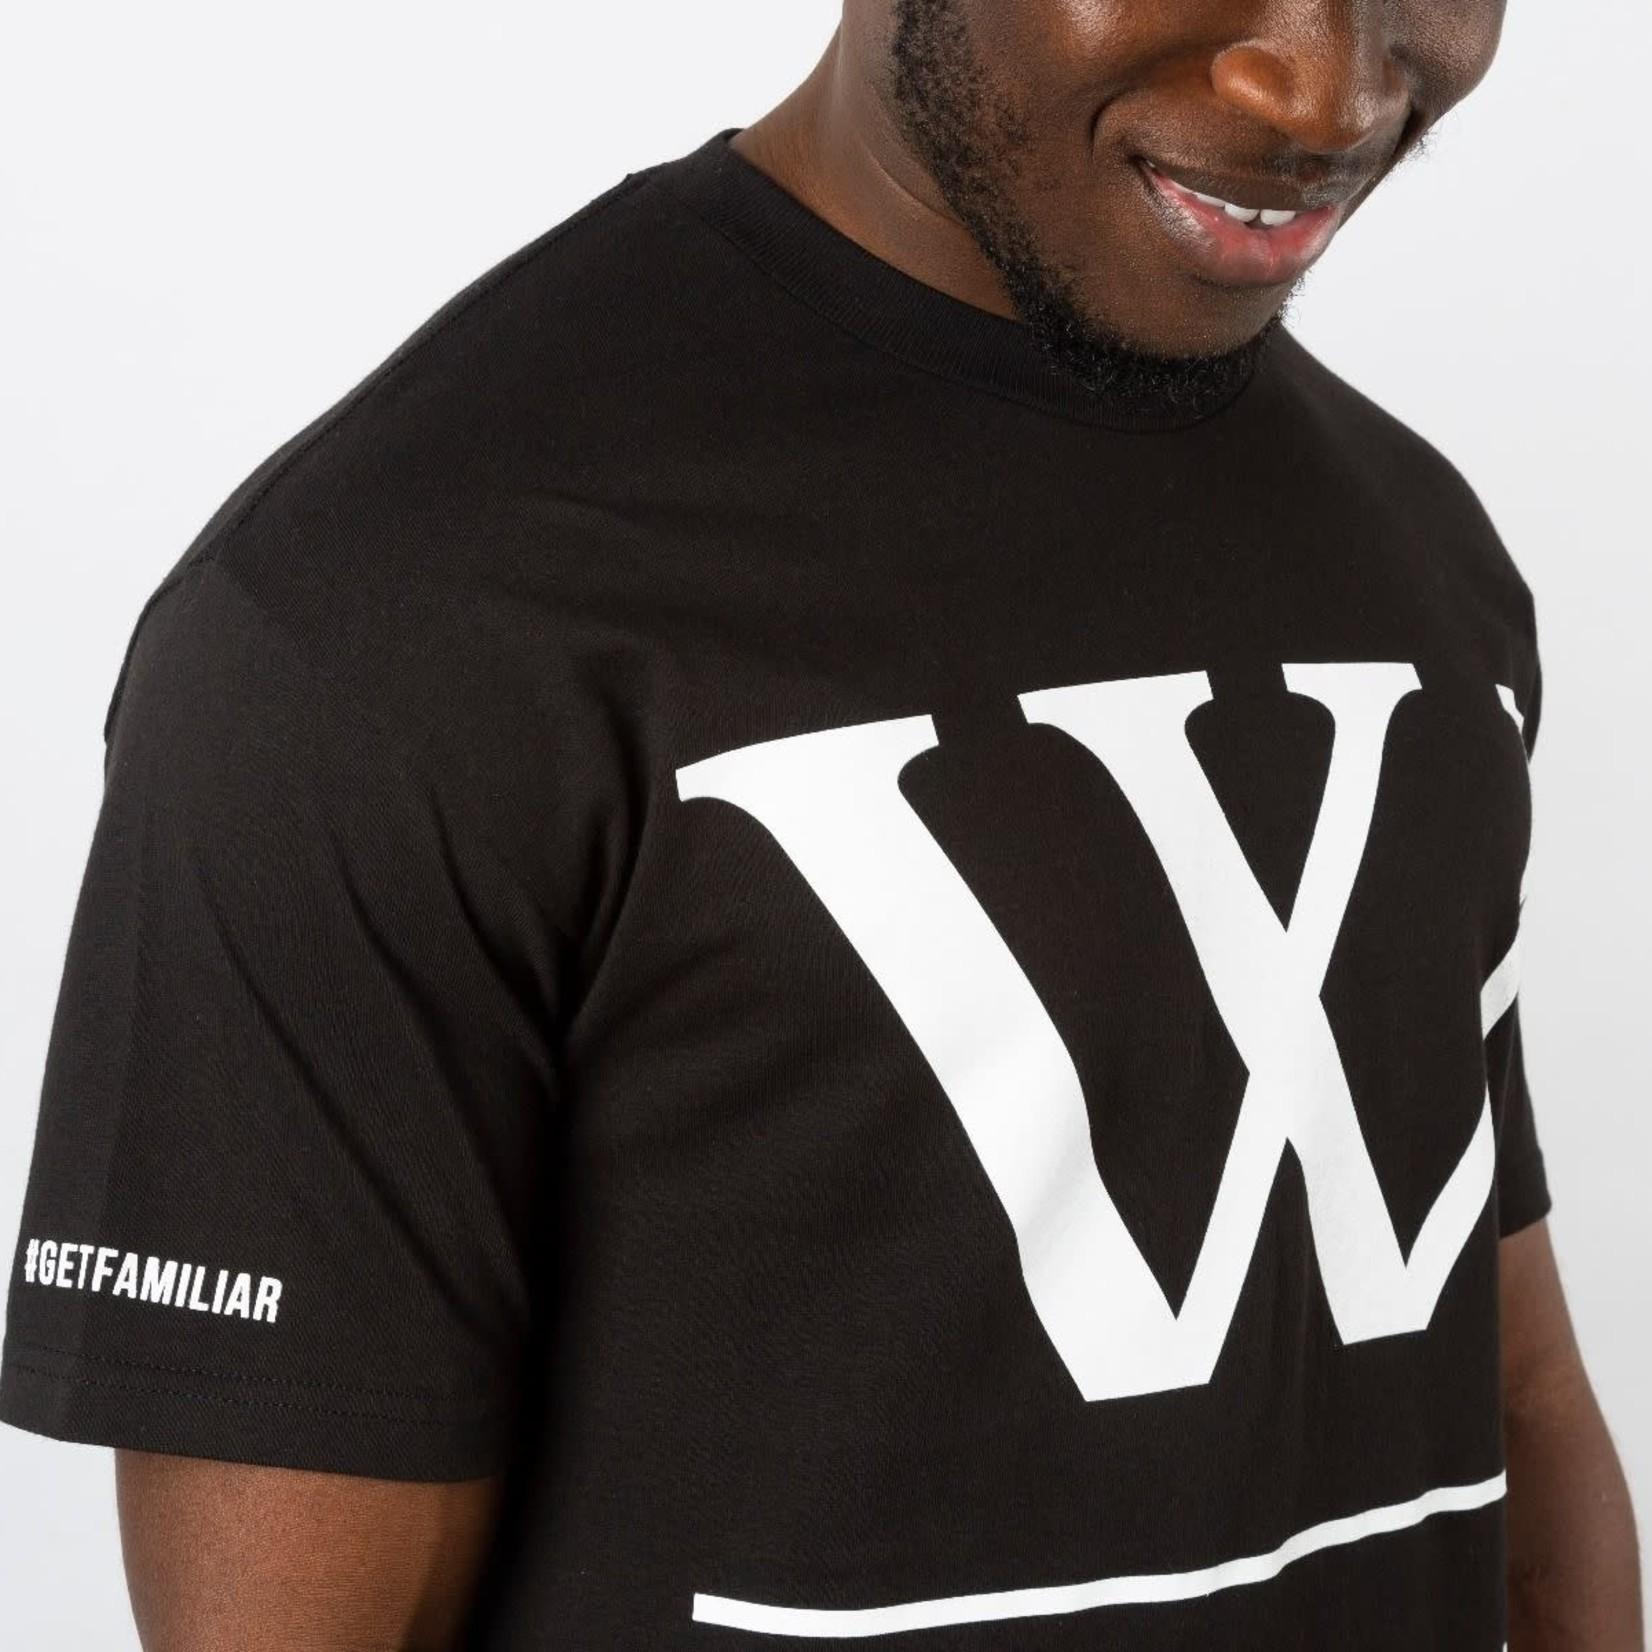 WLKN WLKN : The Men Basic Logo T-Shirt